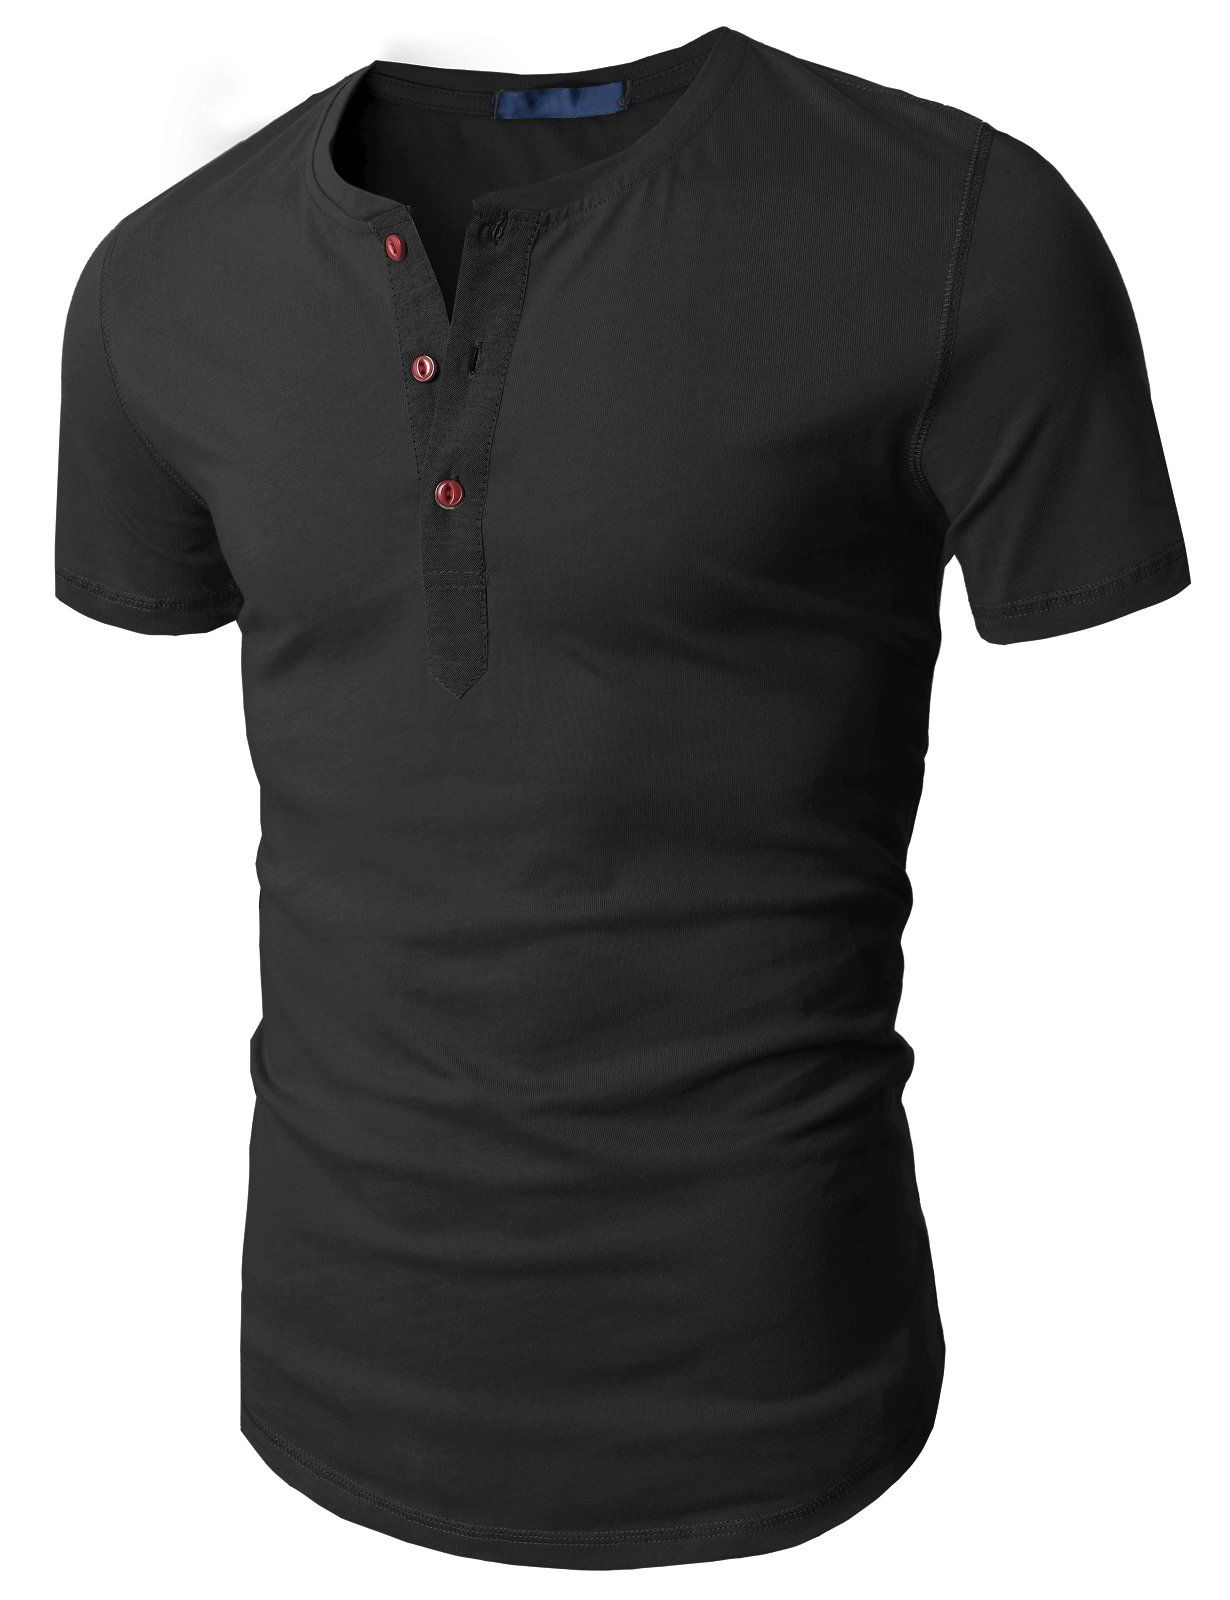 Doublju Mens Fashion Henley Short Sleeve Slim Fit Shirts at Amazon Men's Clothing store: